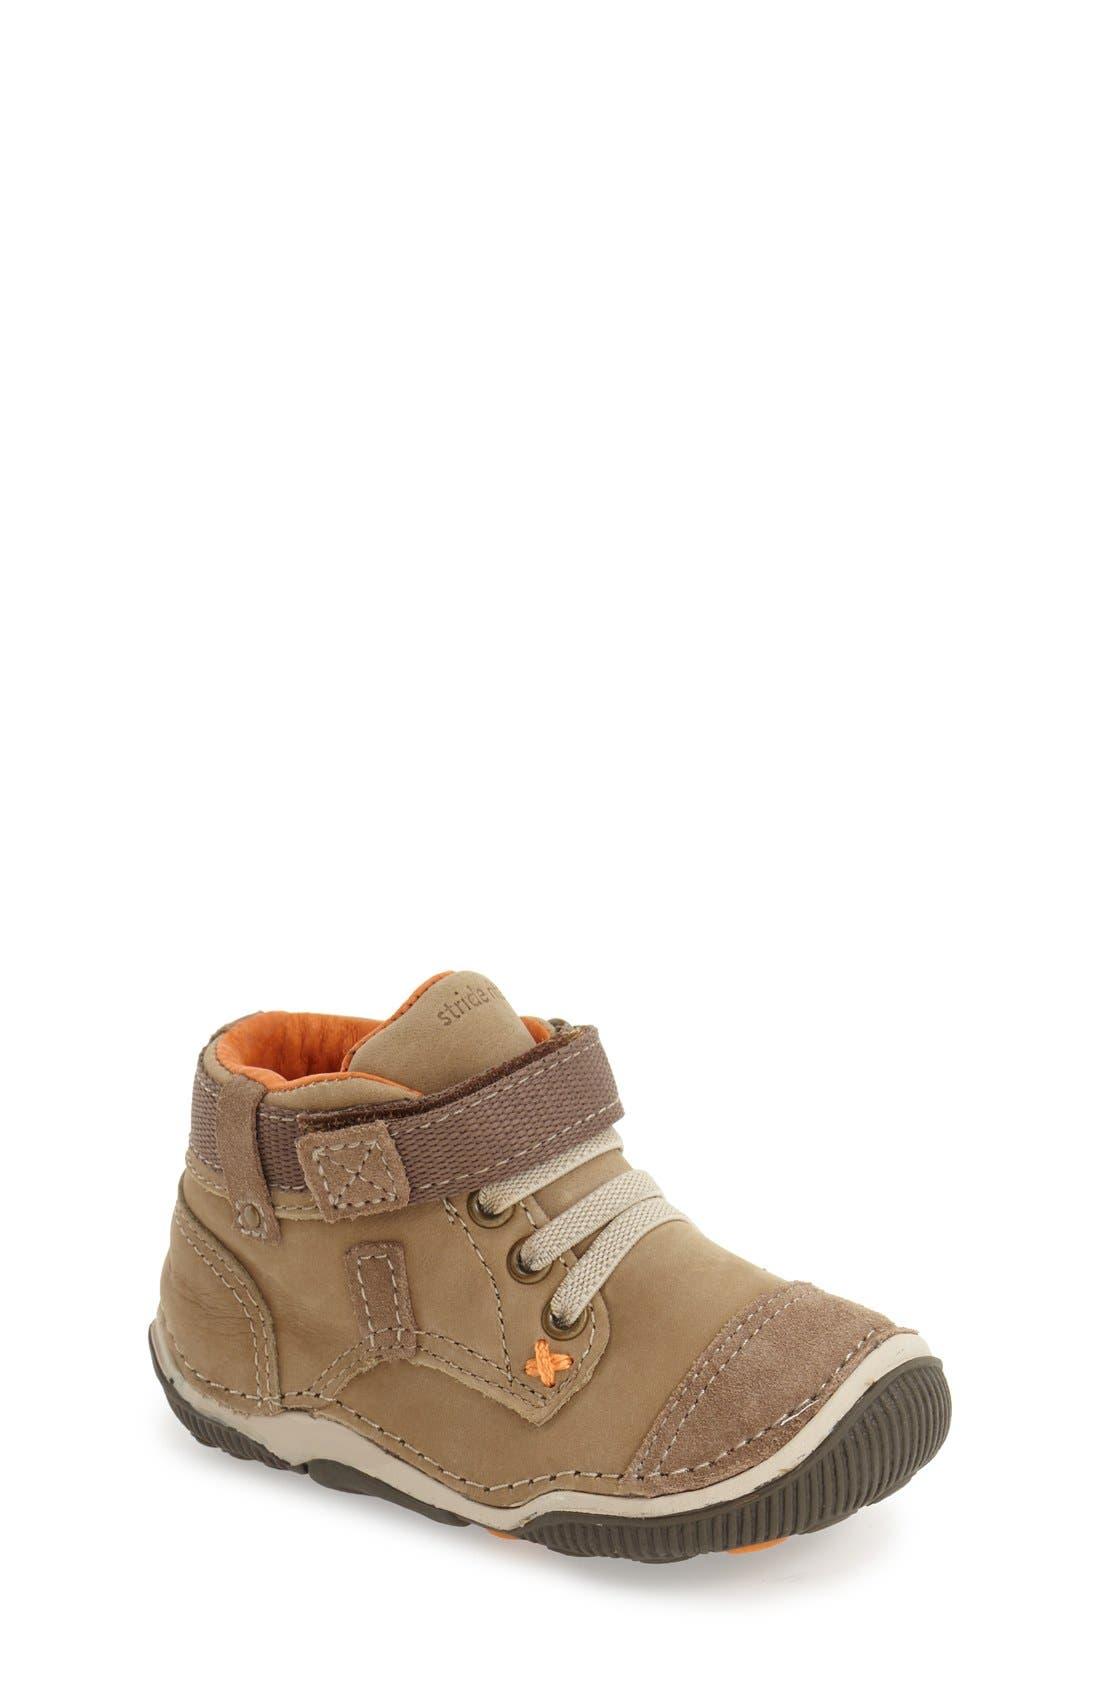 'Garrett' High Top Bootie Sneaker,                             Main thumbnail 1, color,                             BROWN